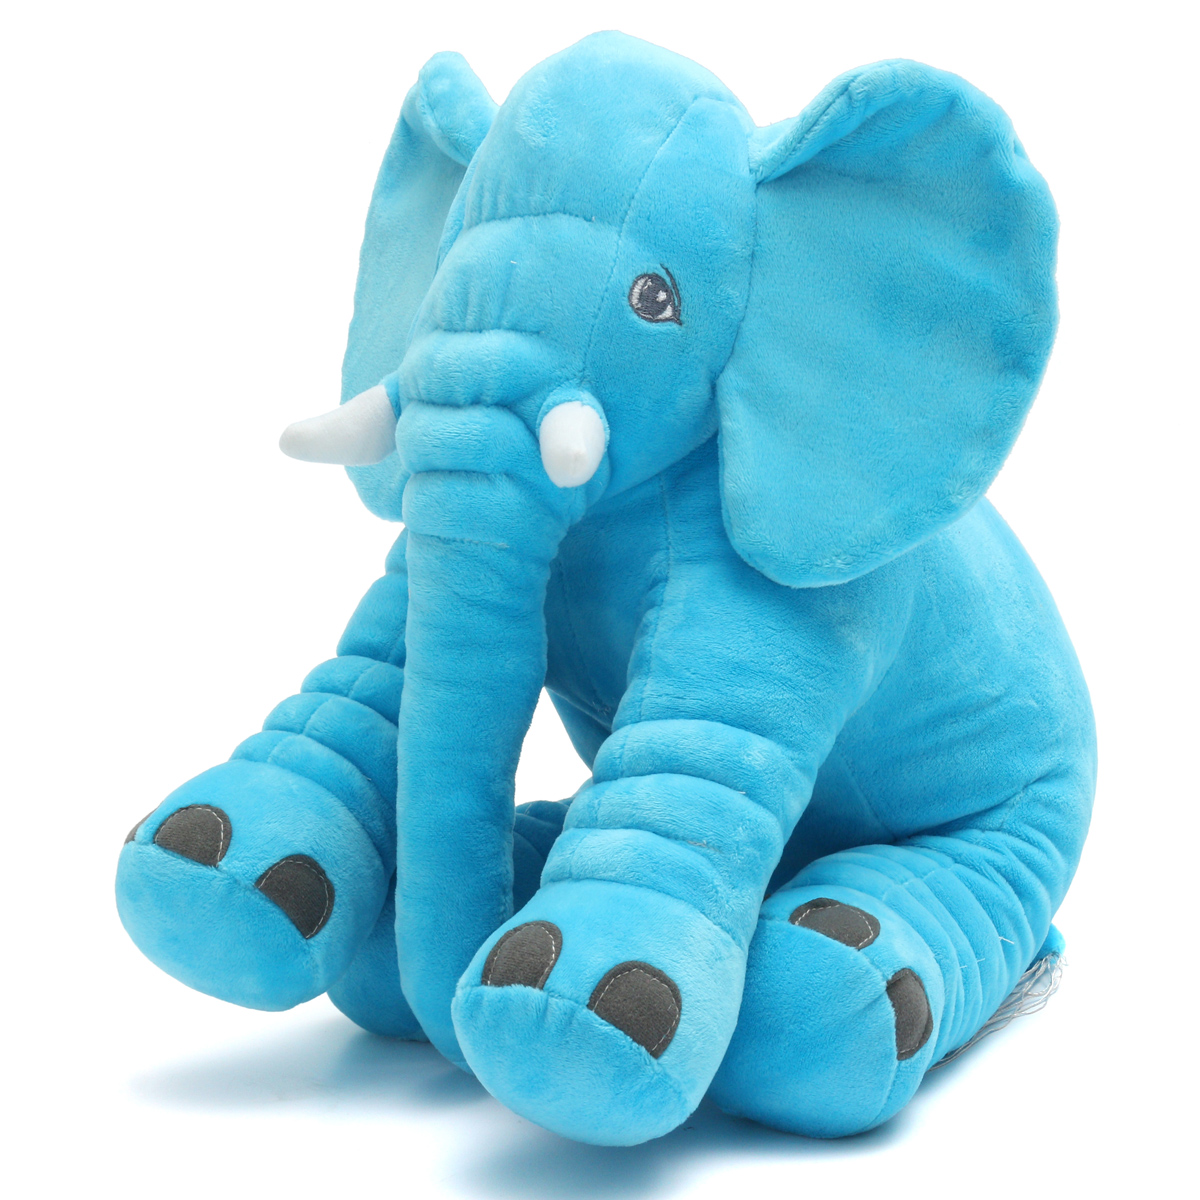 35x40cm Baby Children Kids Soft Plush Elephant Sleep